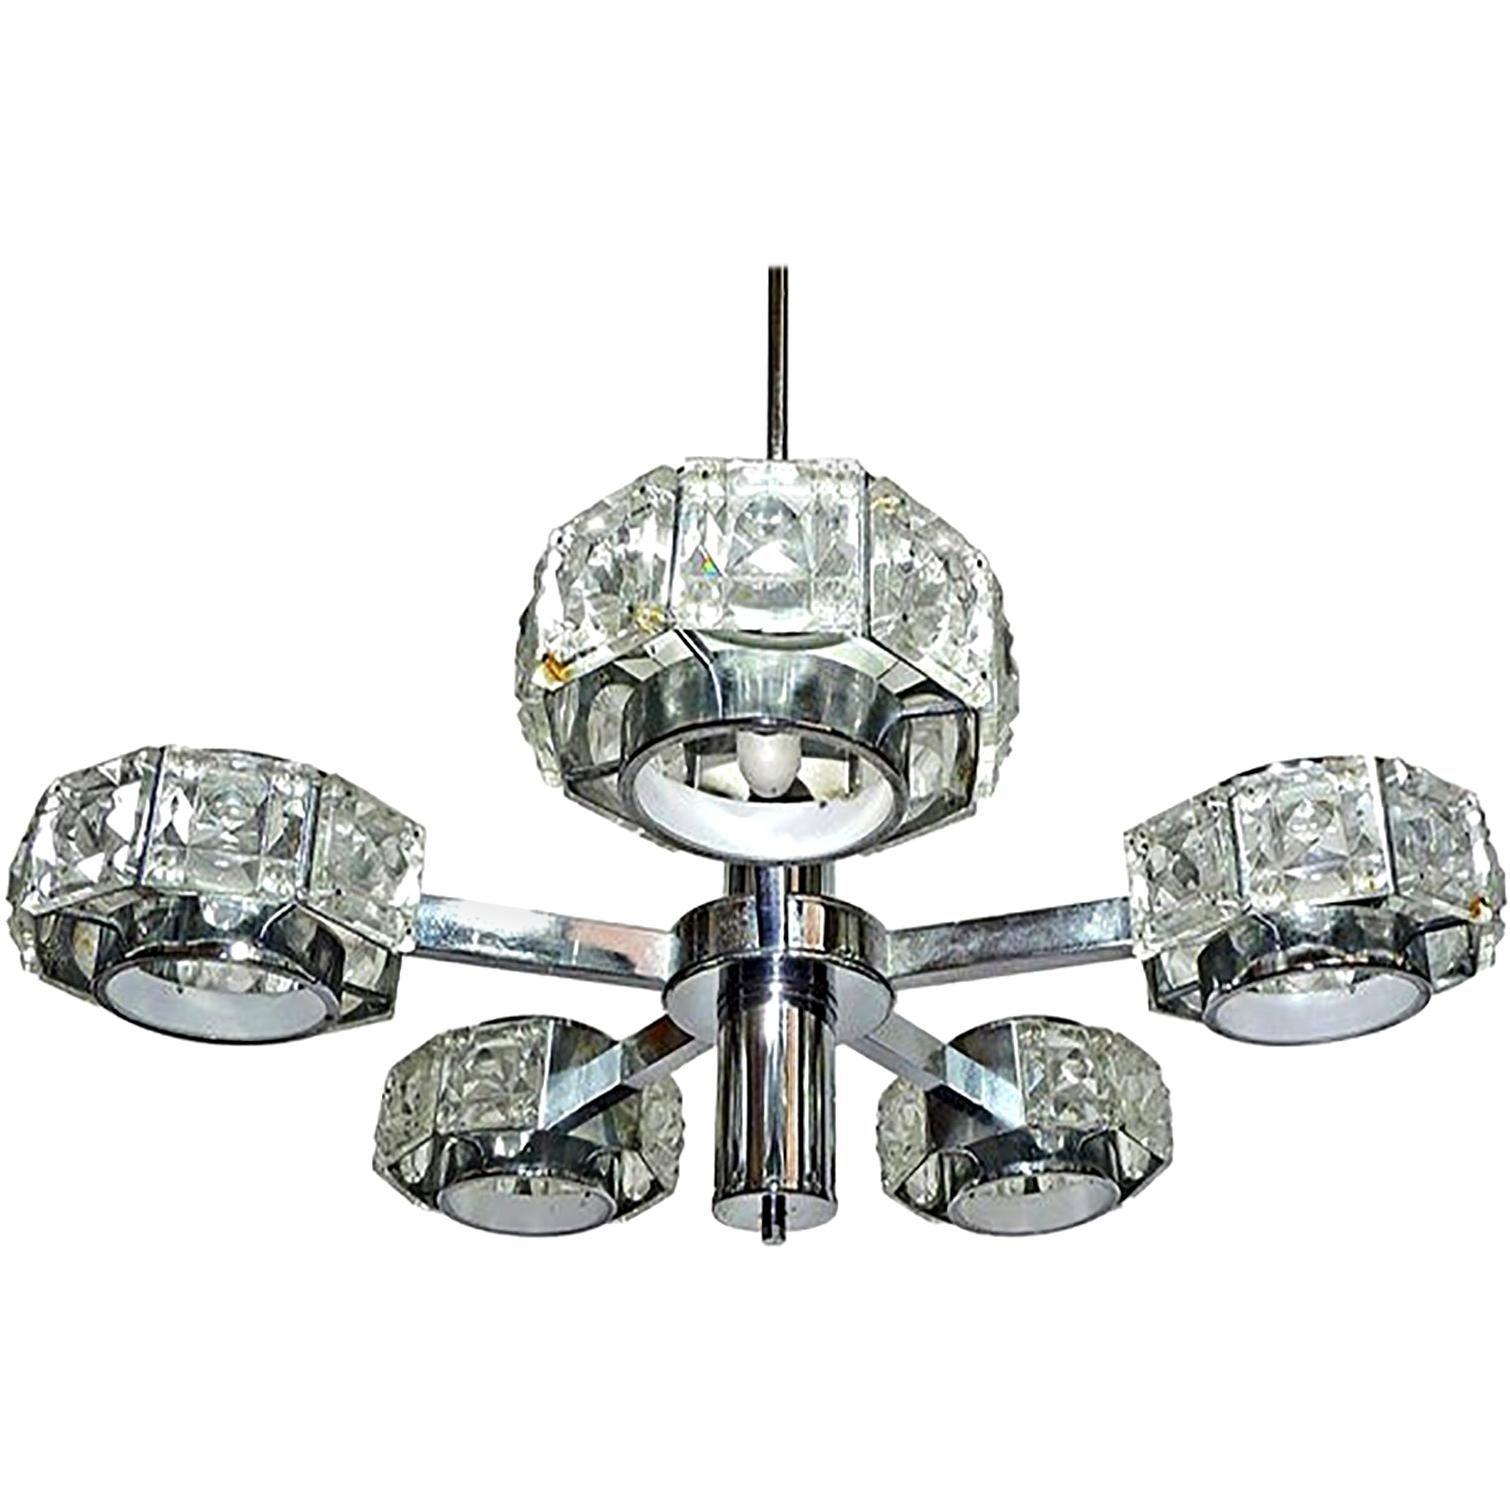 Modernist Midcentury Gaetano Sciolari Crystal and Chrome Sculptural Chandelier